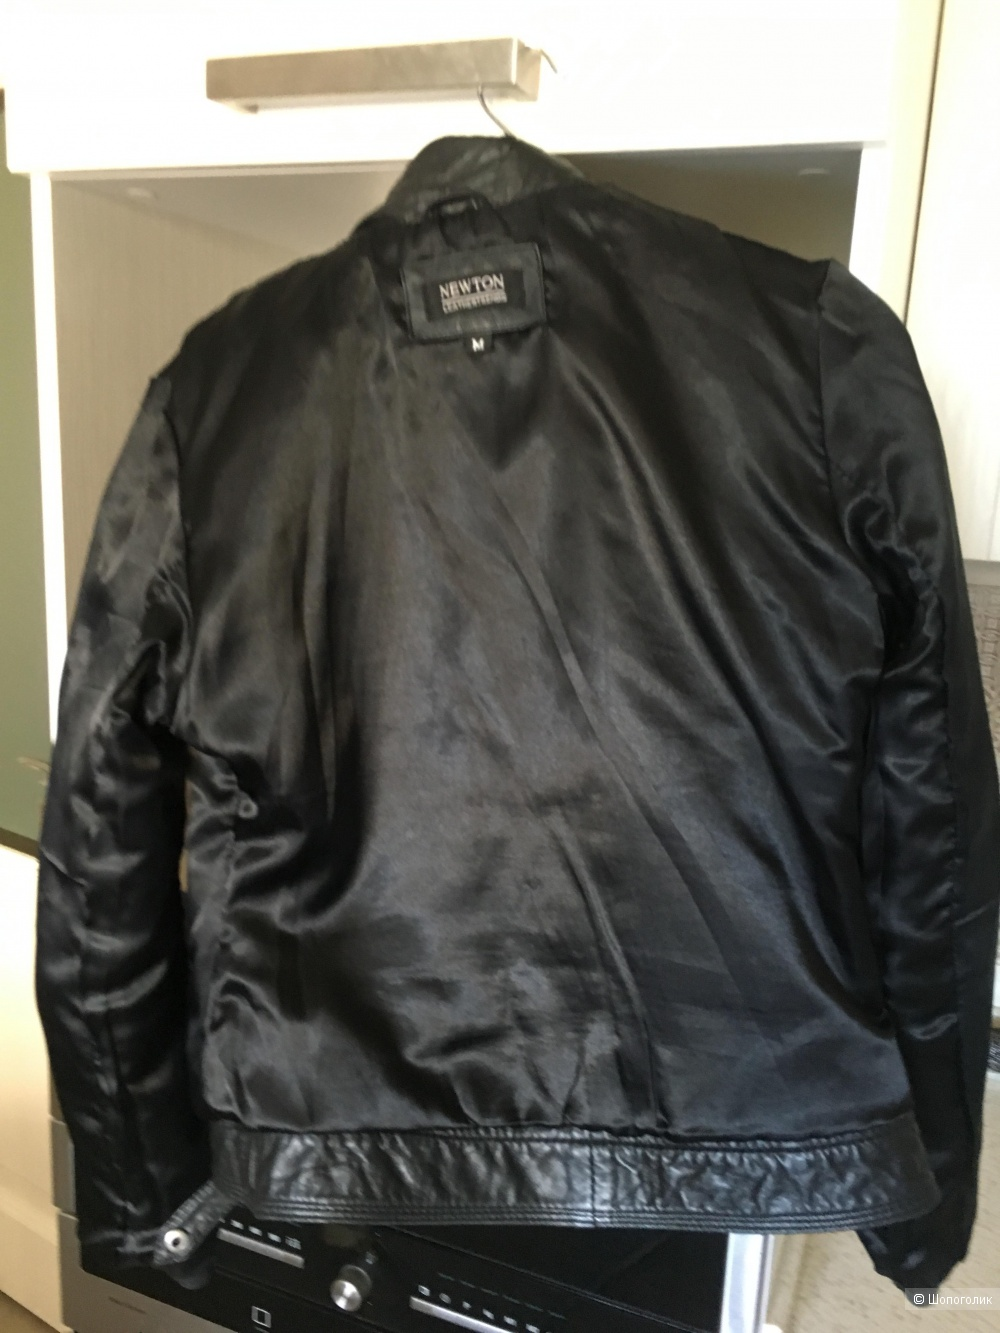 Кожаная куртка, фирма Newton, размер М